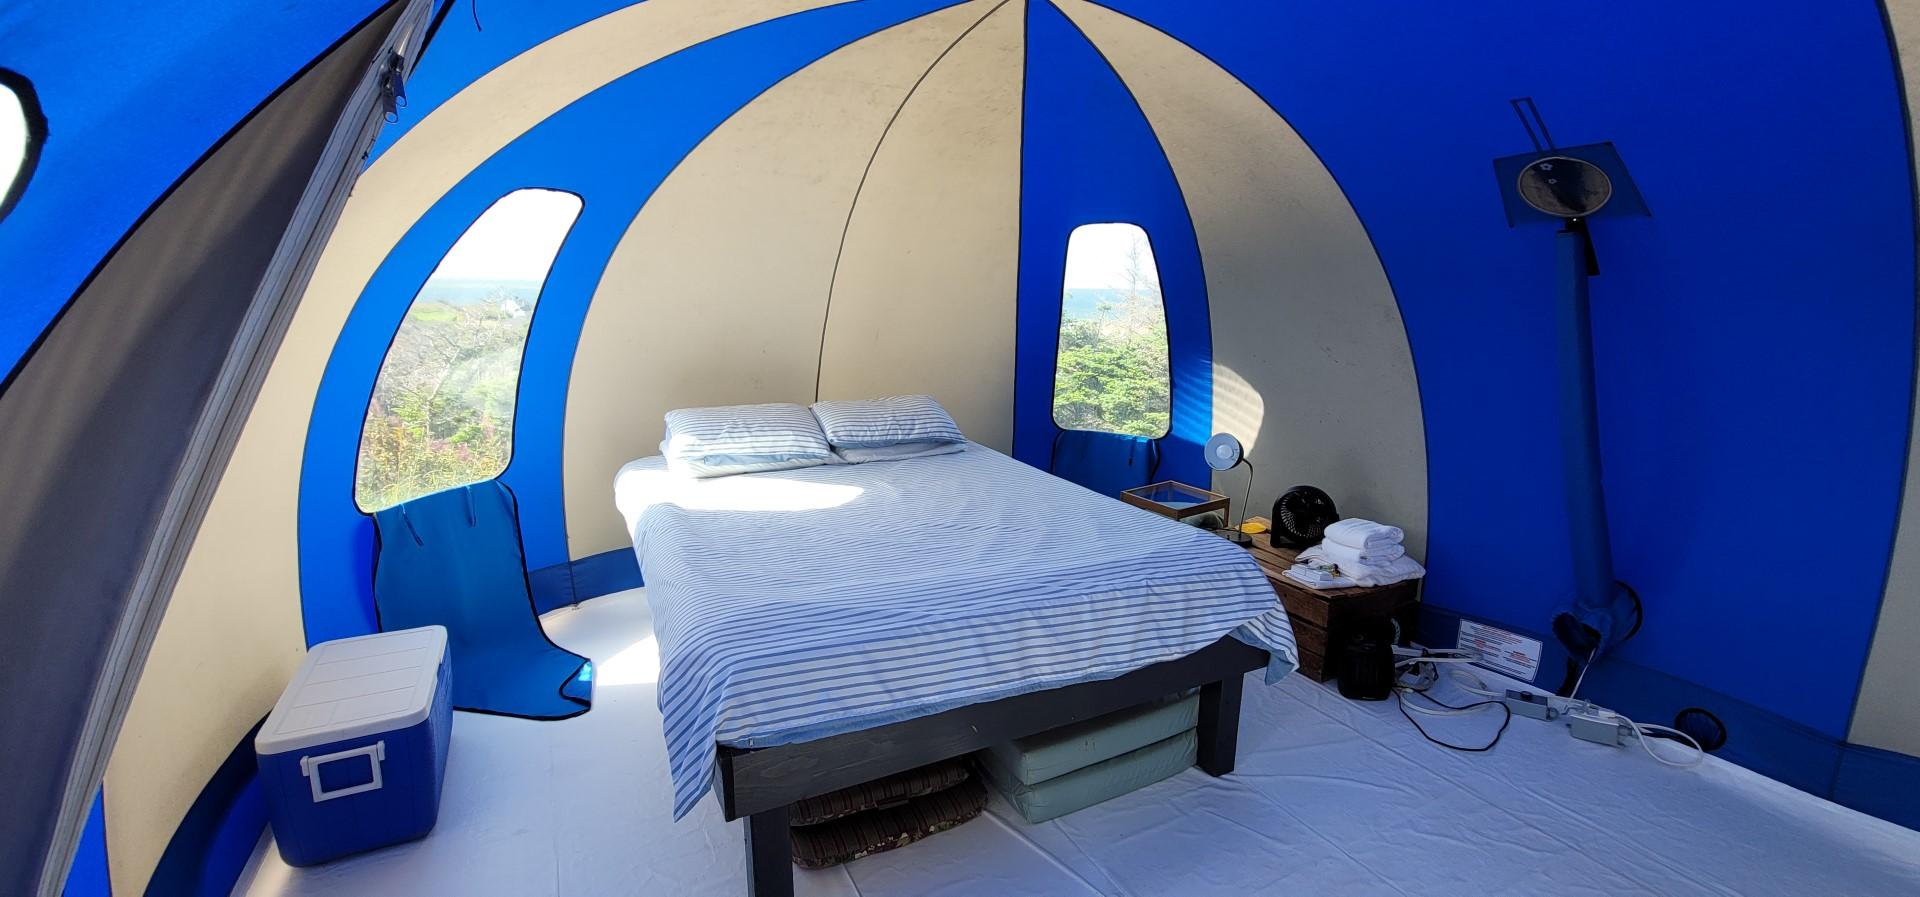 bed in blue dome unique